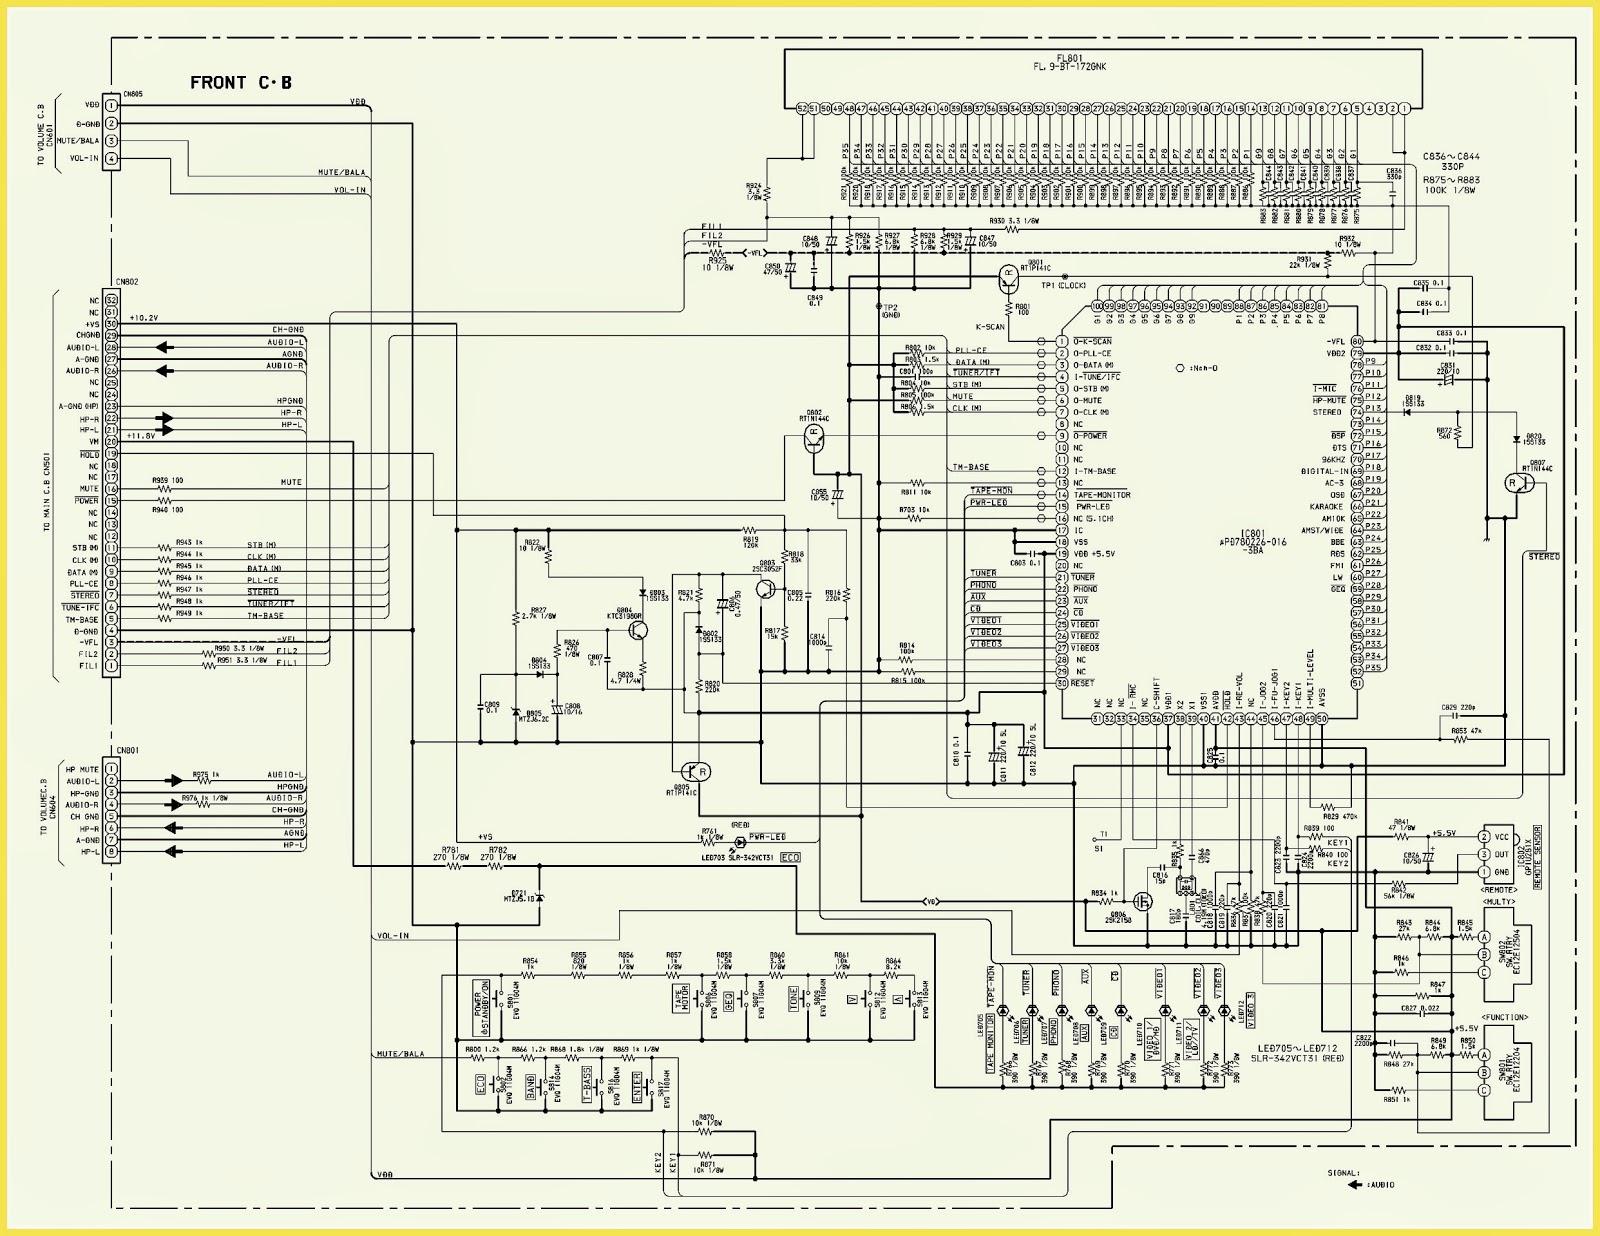 Radio Av Receiver Circuit Diagram Just Another Wiring Blog Intercom Schematic Aiwa S17u Stereo Power Front Rh Electronicshelponline Blogspot Com Am Hf